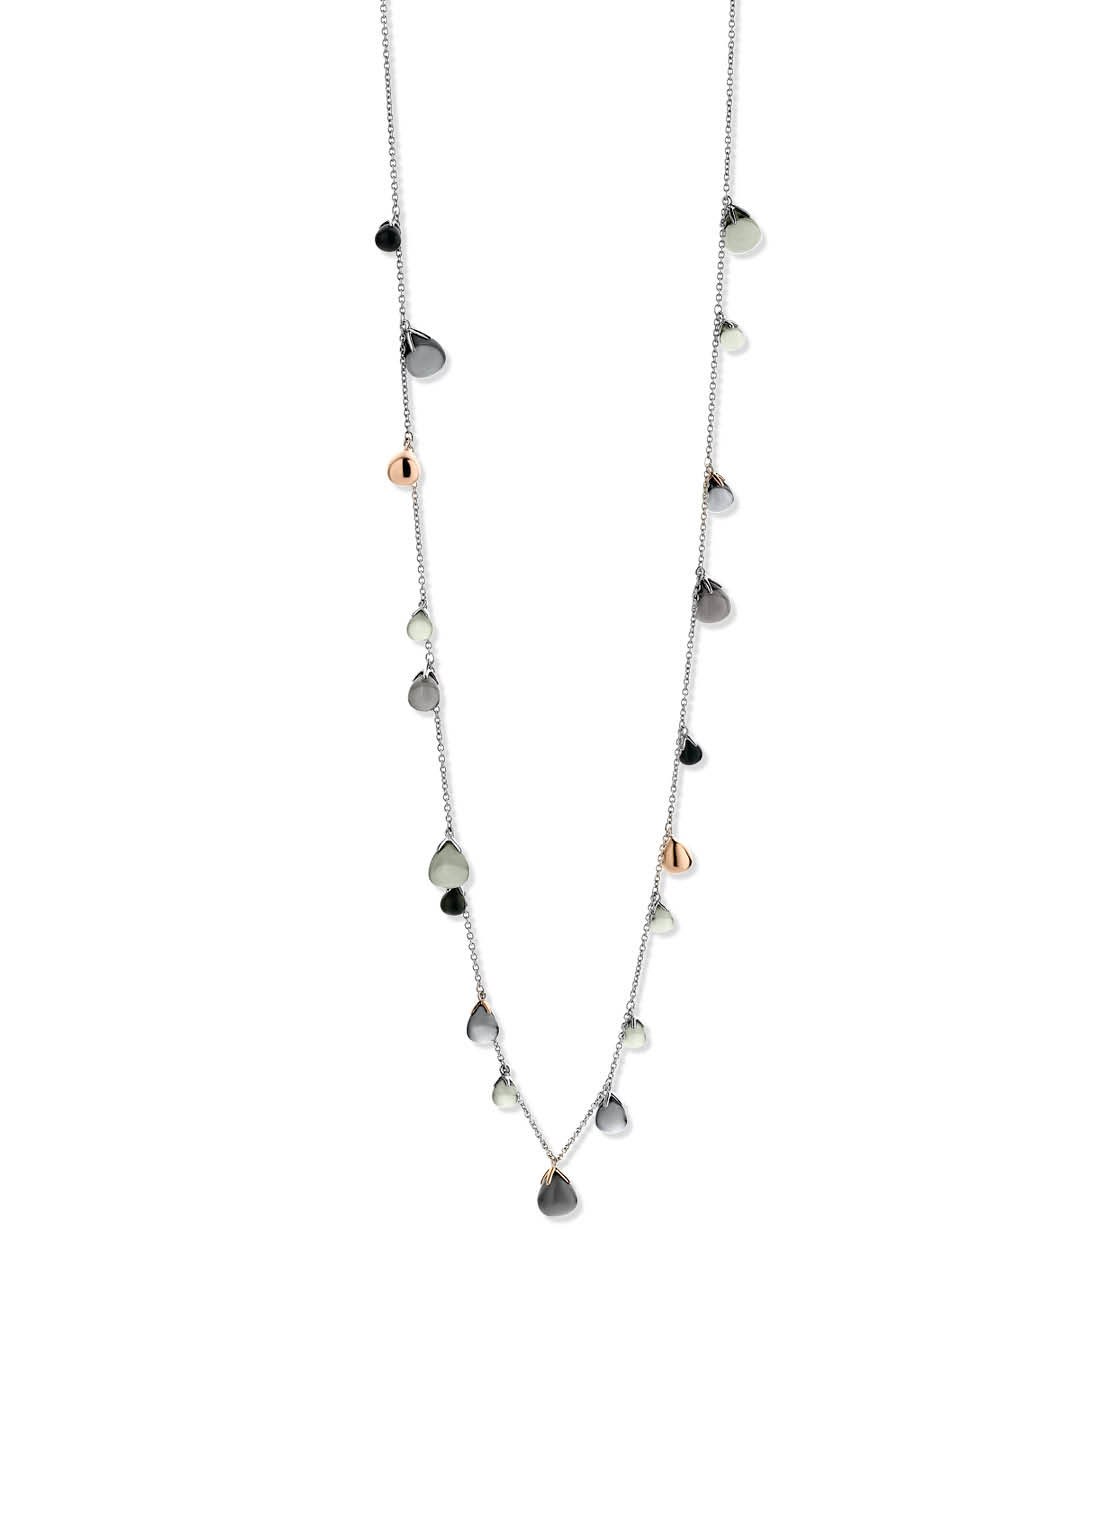 TI SENTO - Milano Necklace 3929BG-3